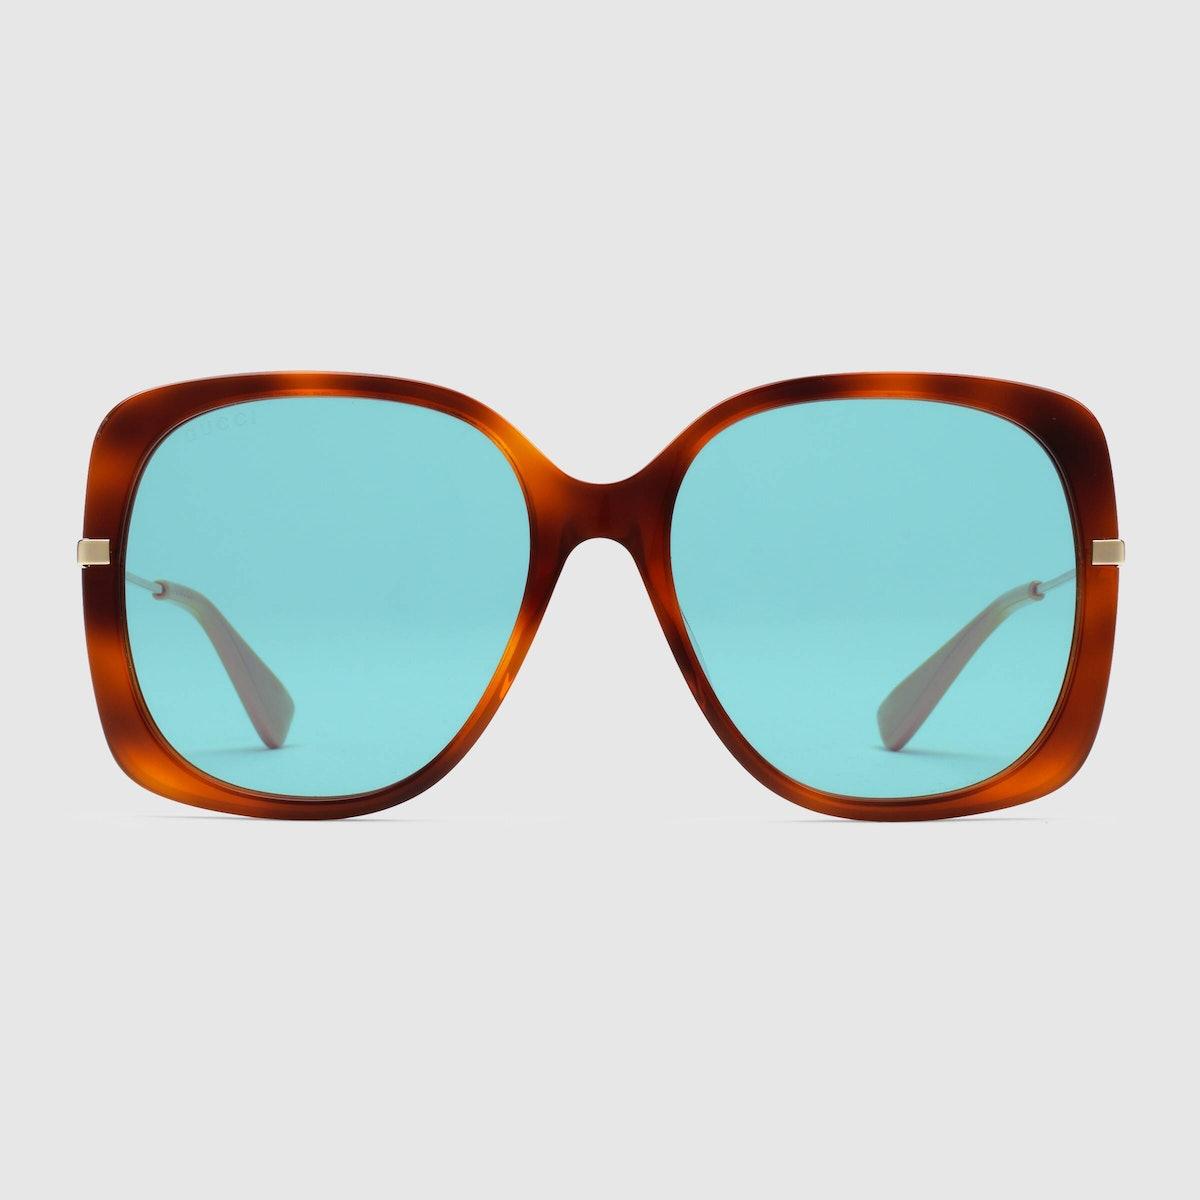 Square Torti Sunglasses